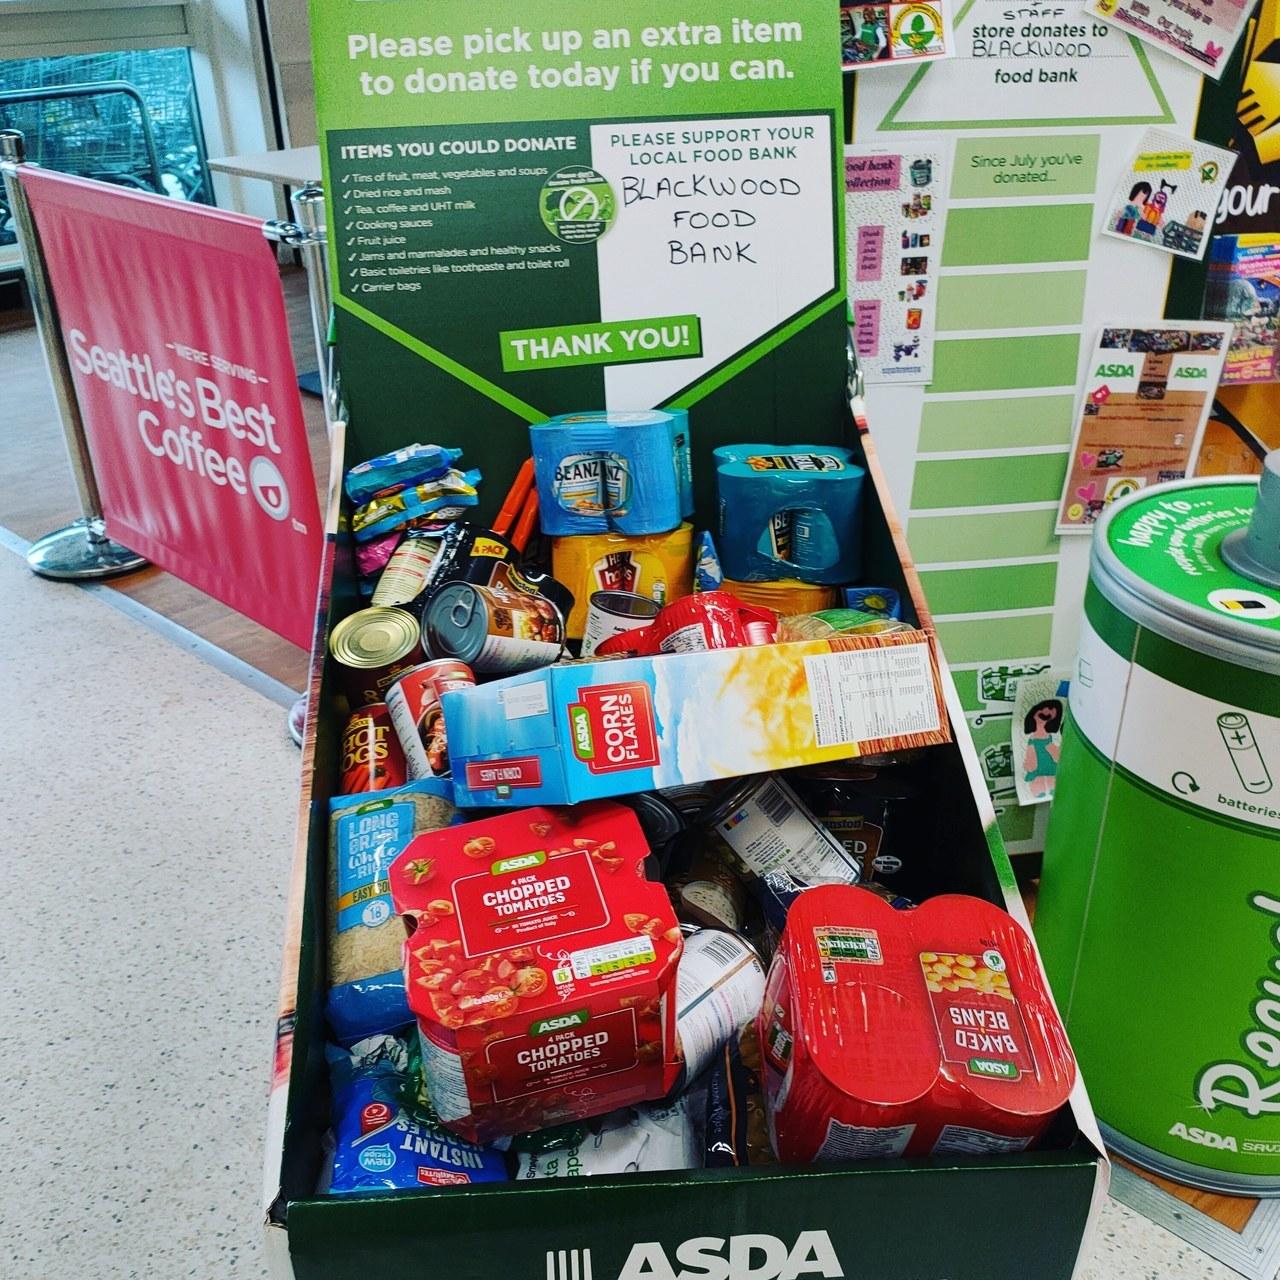 Food bank donation   Asda Blackwood